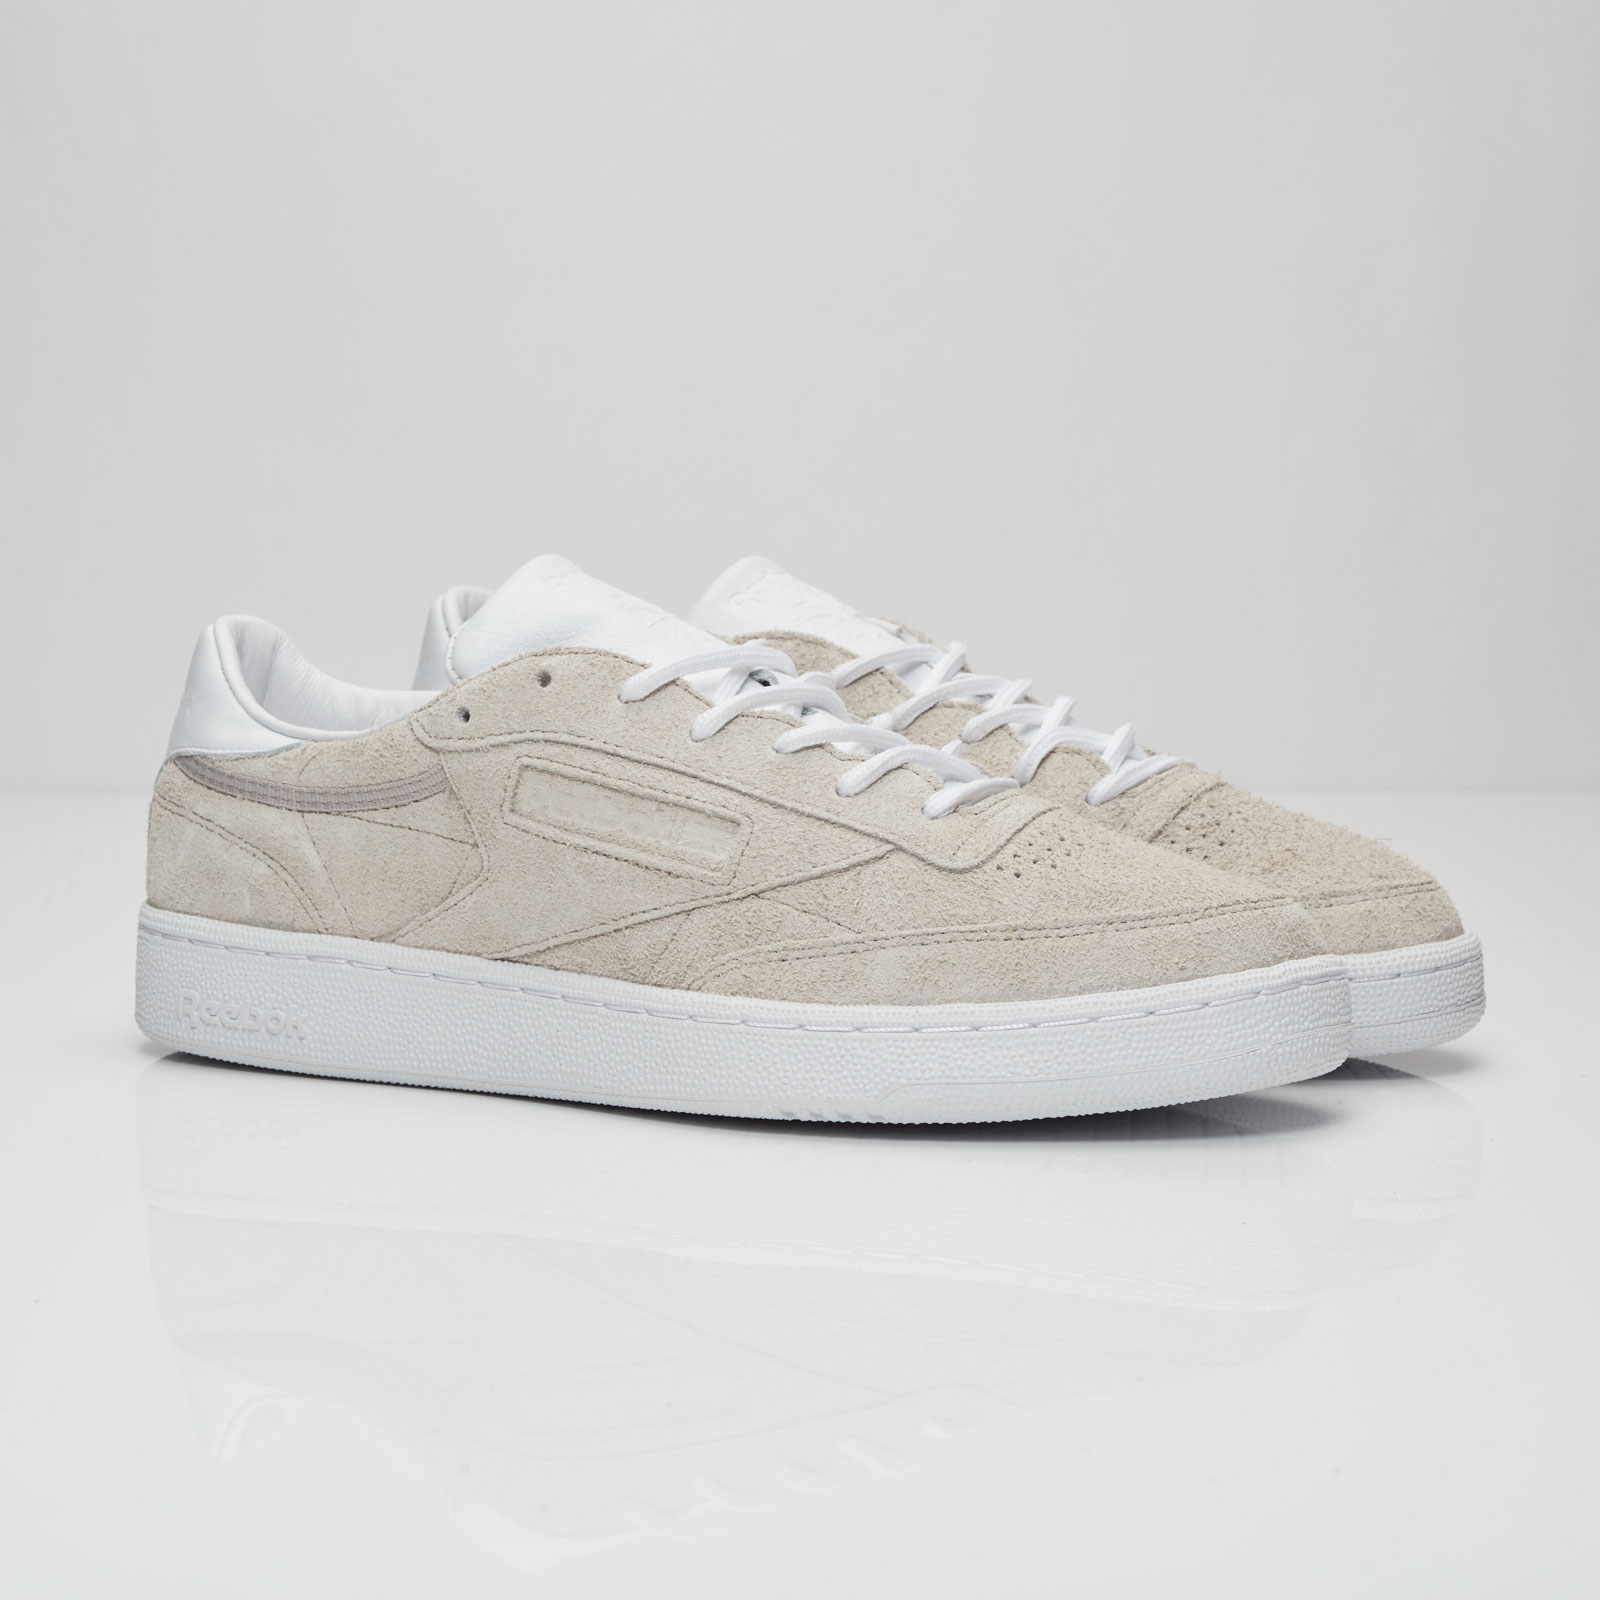 5f120a94159 Reebok Club C 85 AFF - Ar3759 - Sneakersnstuff